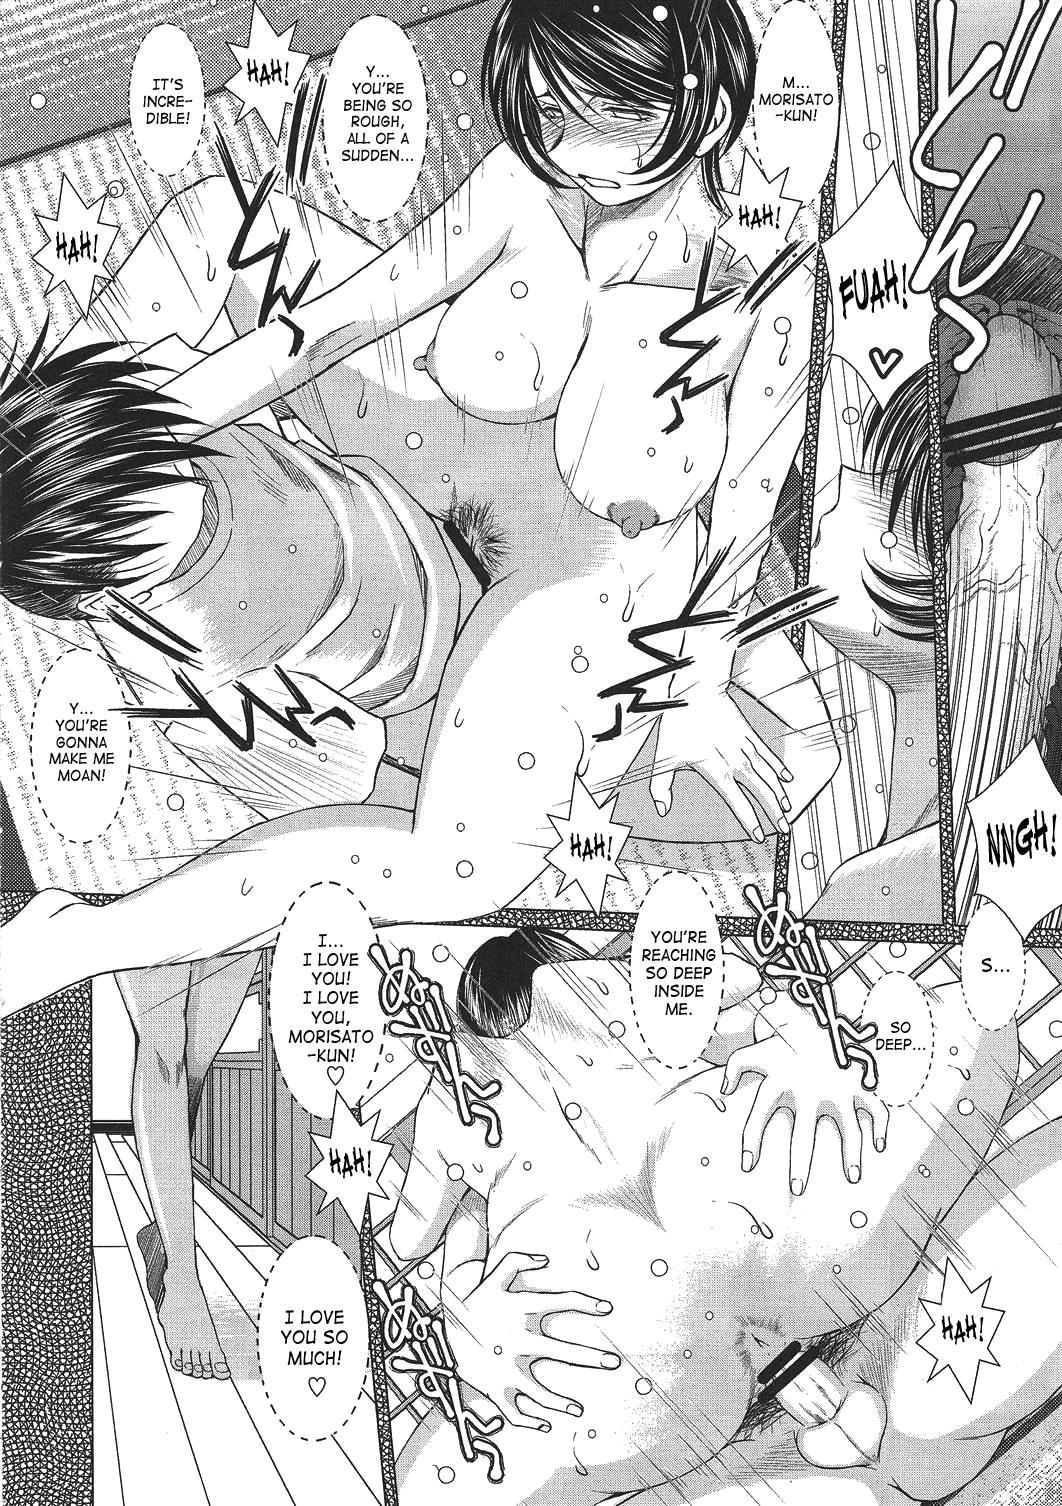 (C63) [CIRCLE OUTERWORLD (Chiba Shuusaku)] Midgard  (Ah! My Goddess) complete [eng] 551